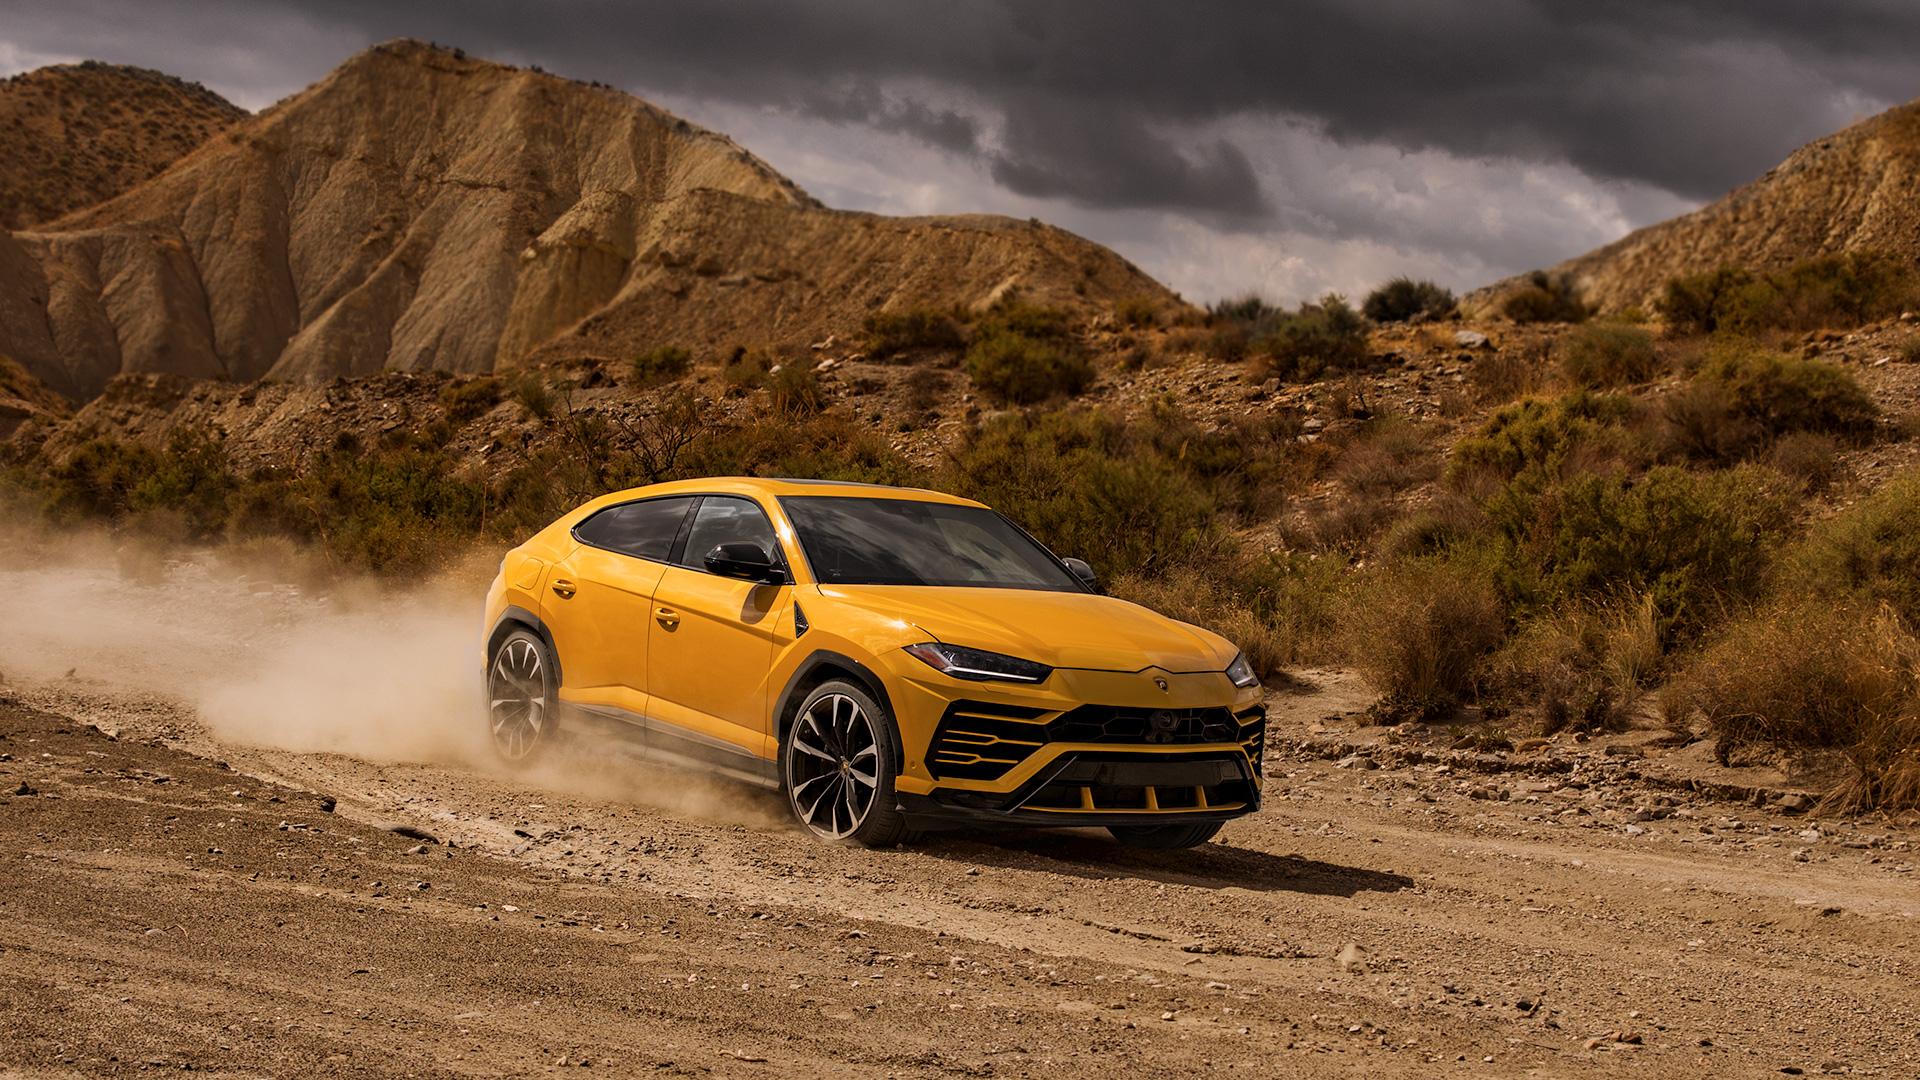 A yellow Lamborghini Urus driving offroad in a desert.